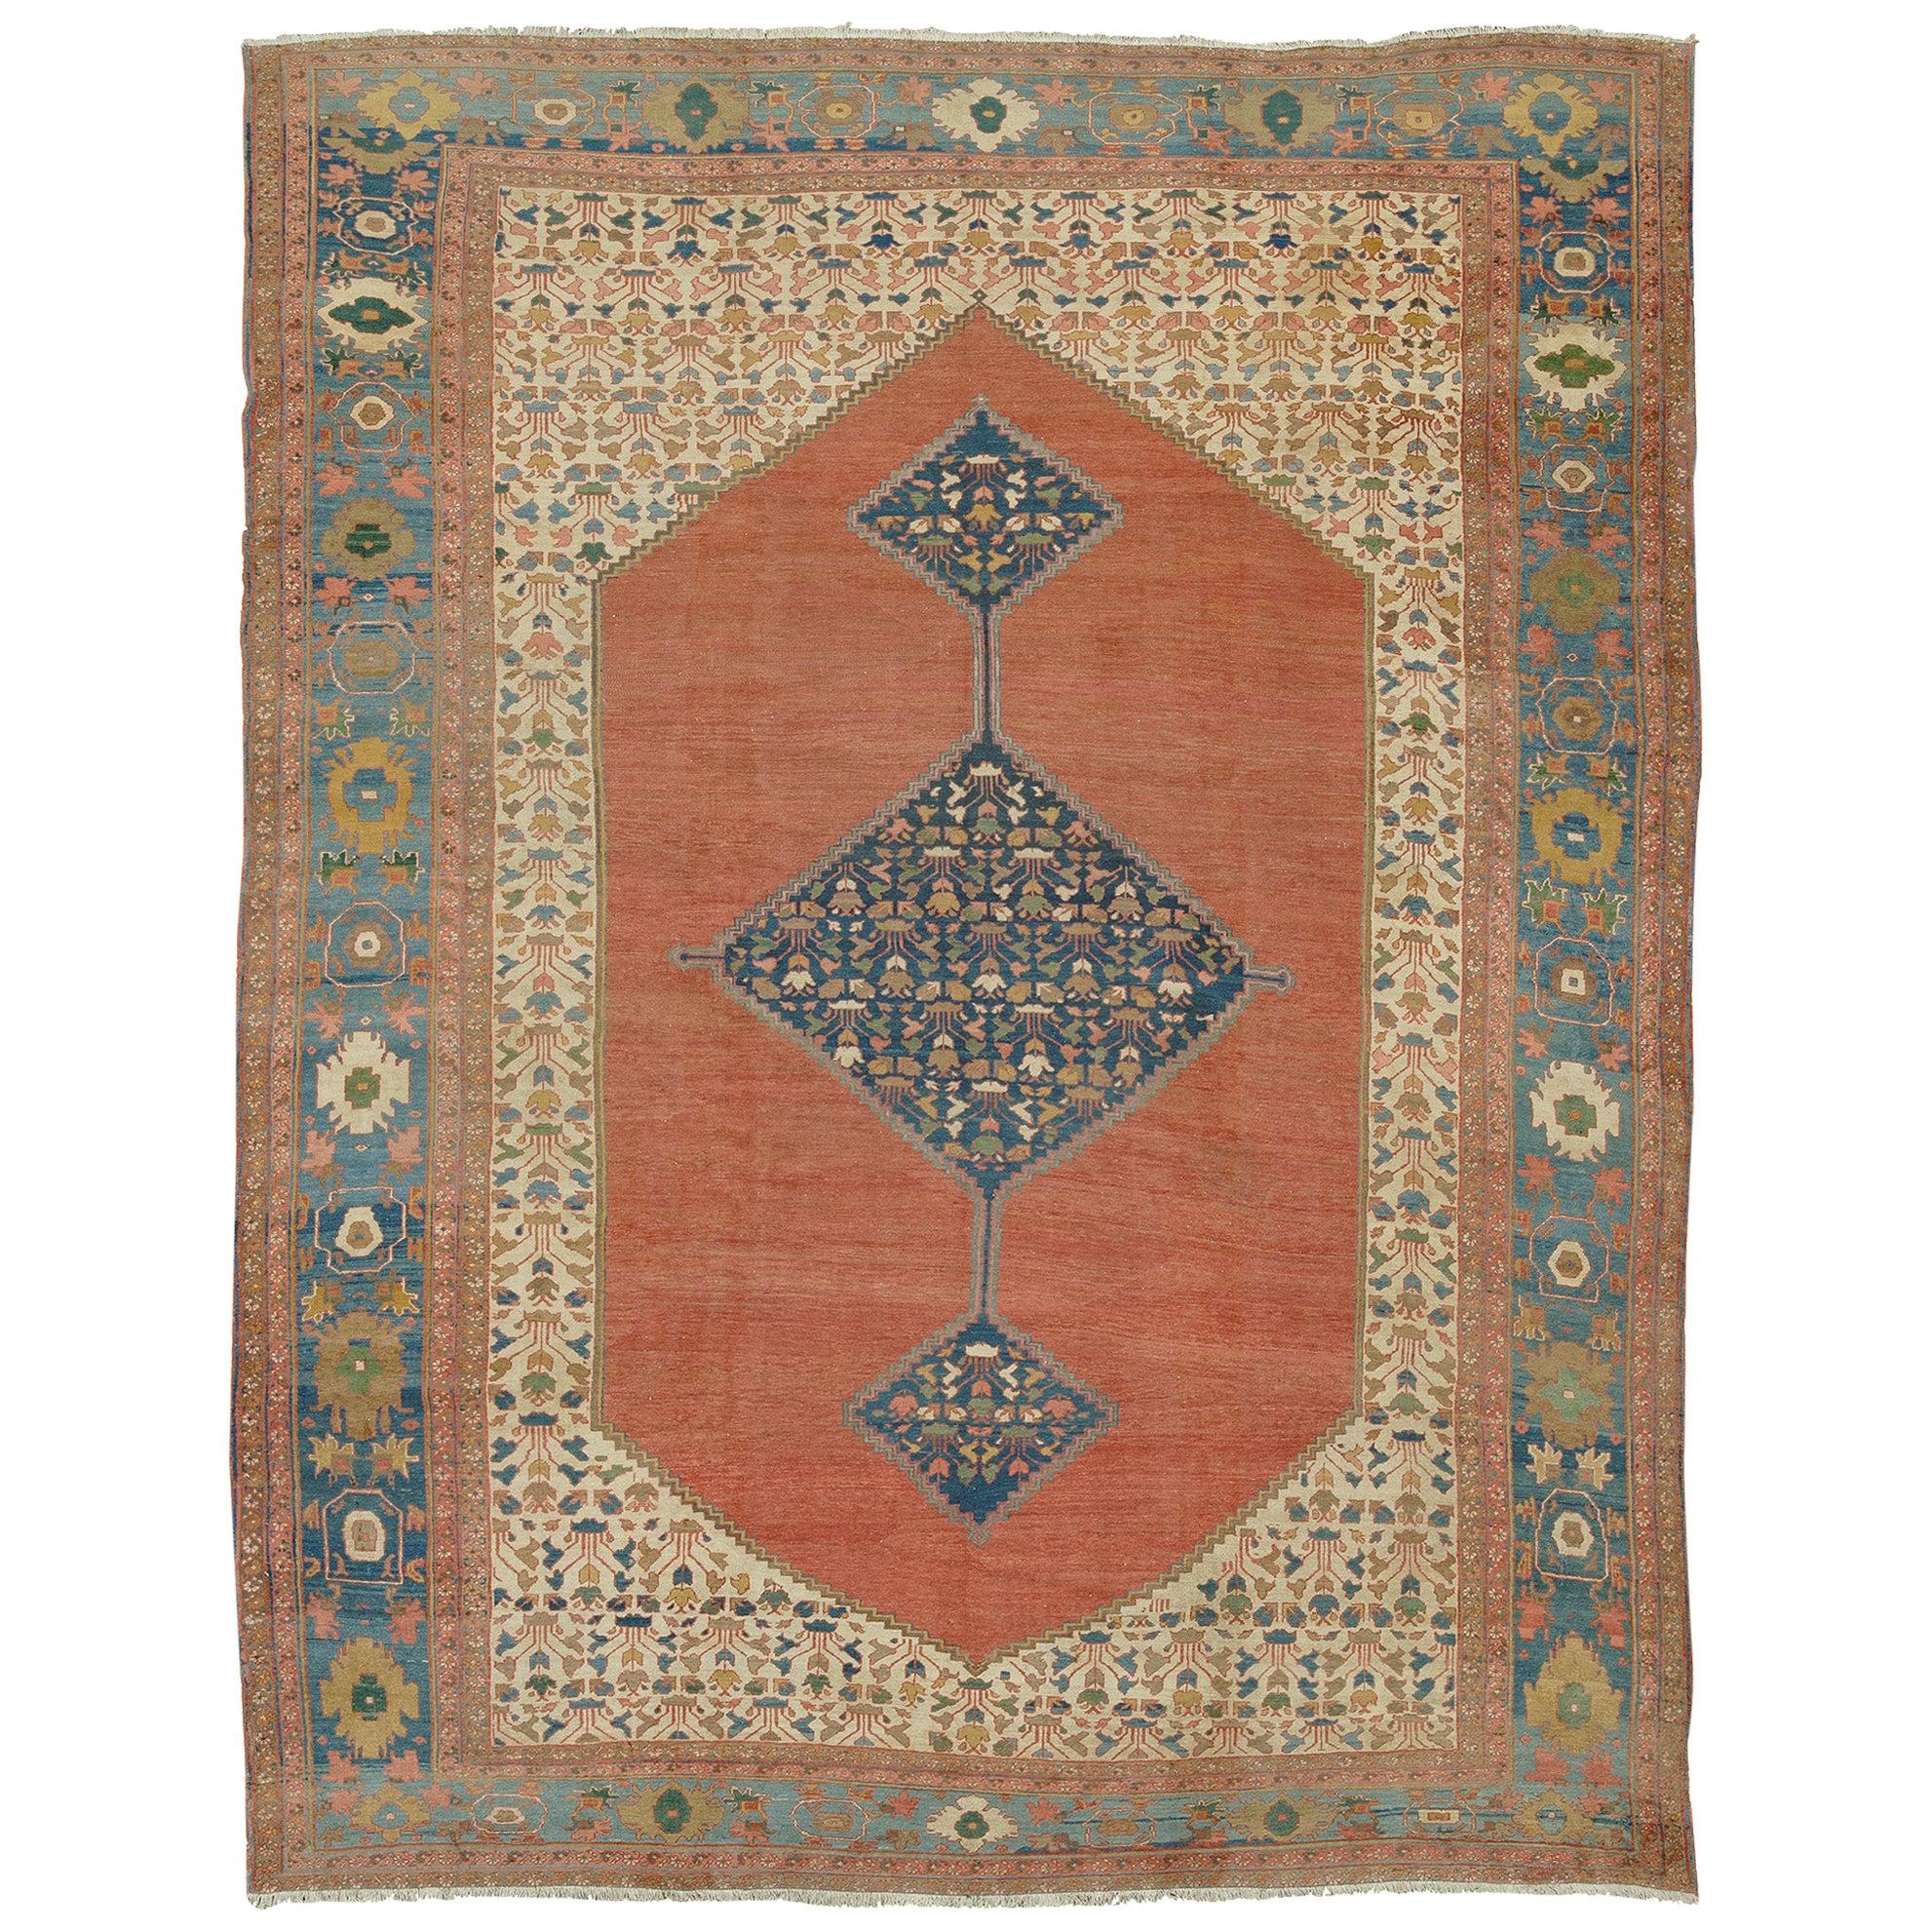 Mid-19th Century Persian Bakshaish Rug